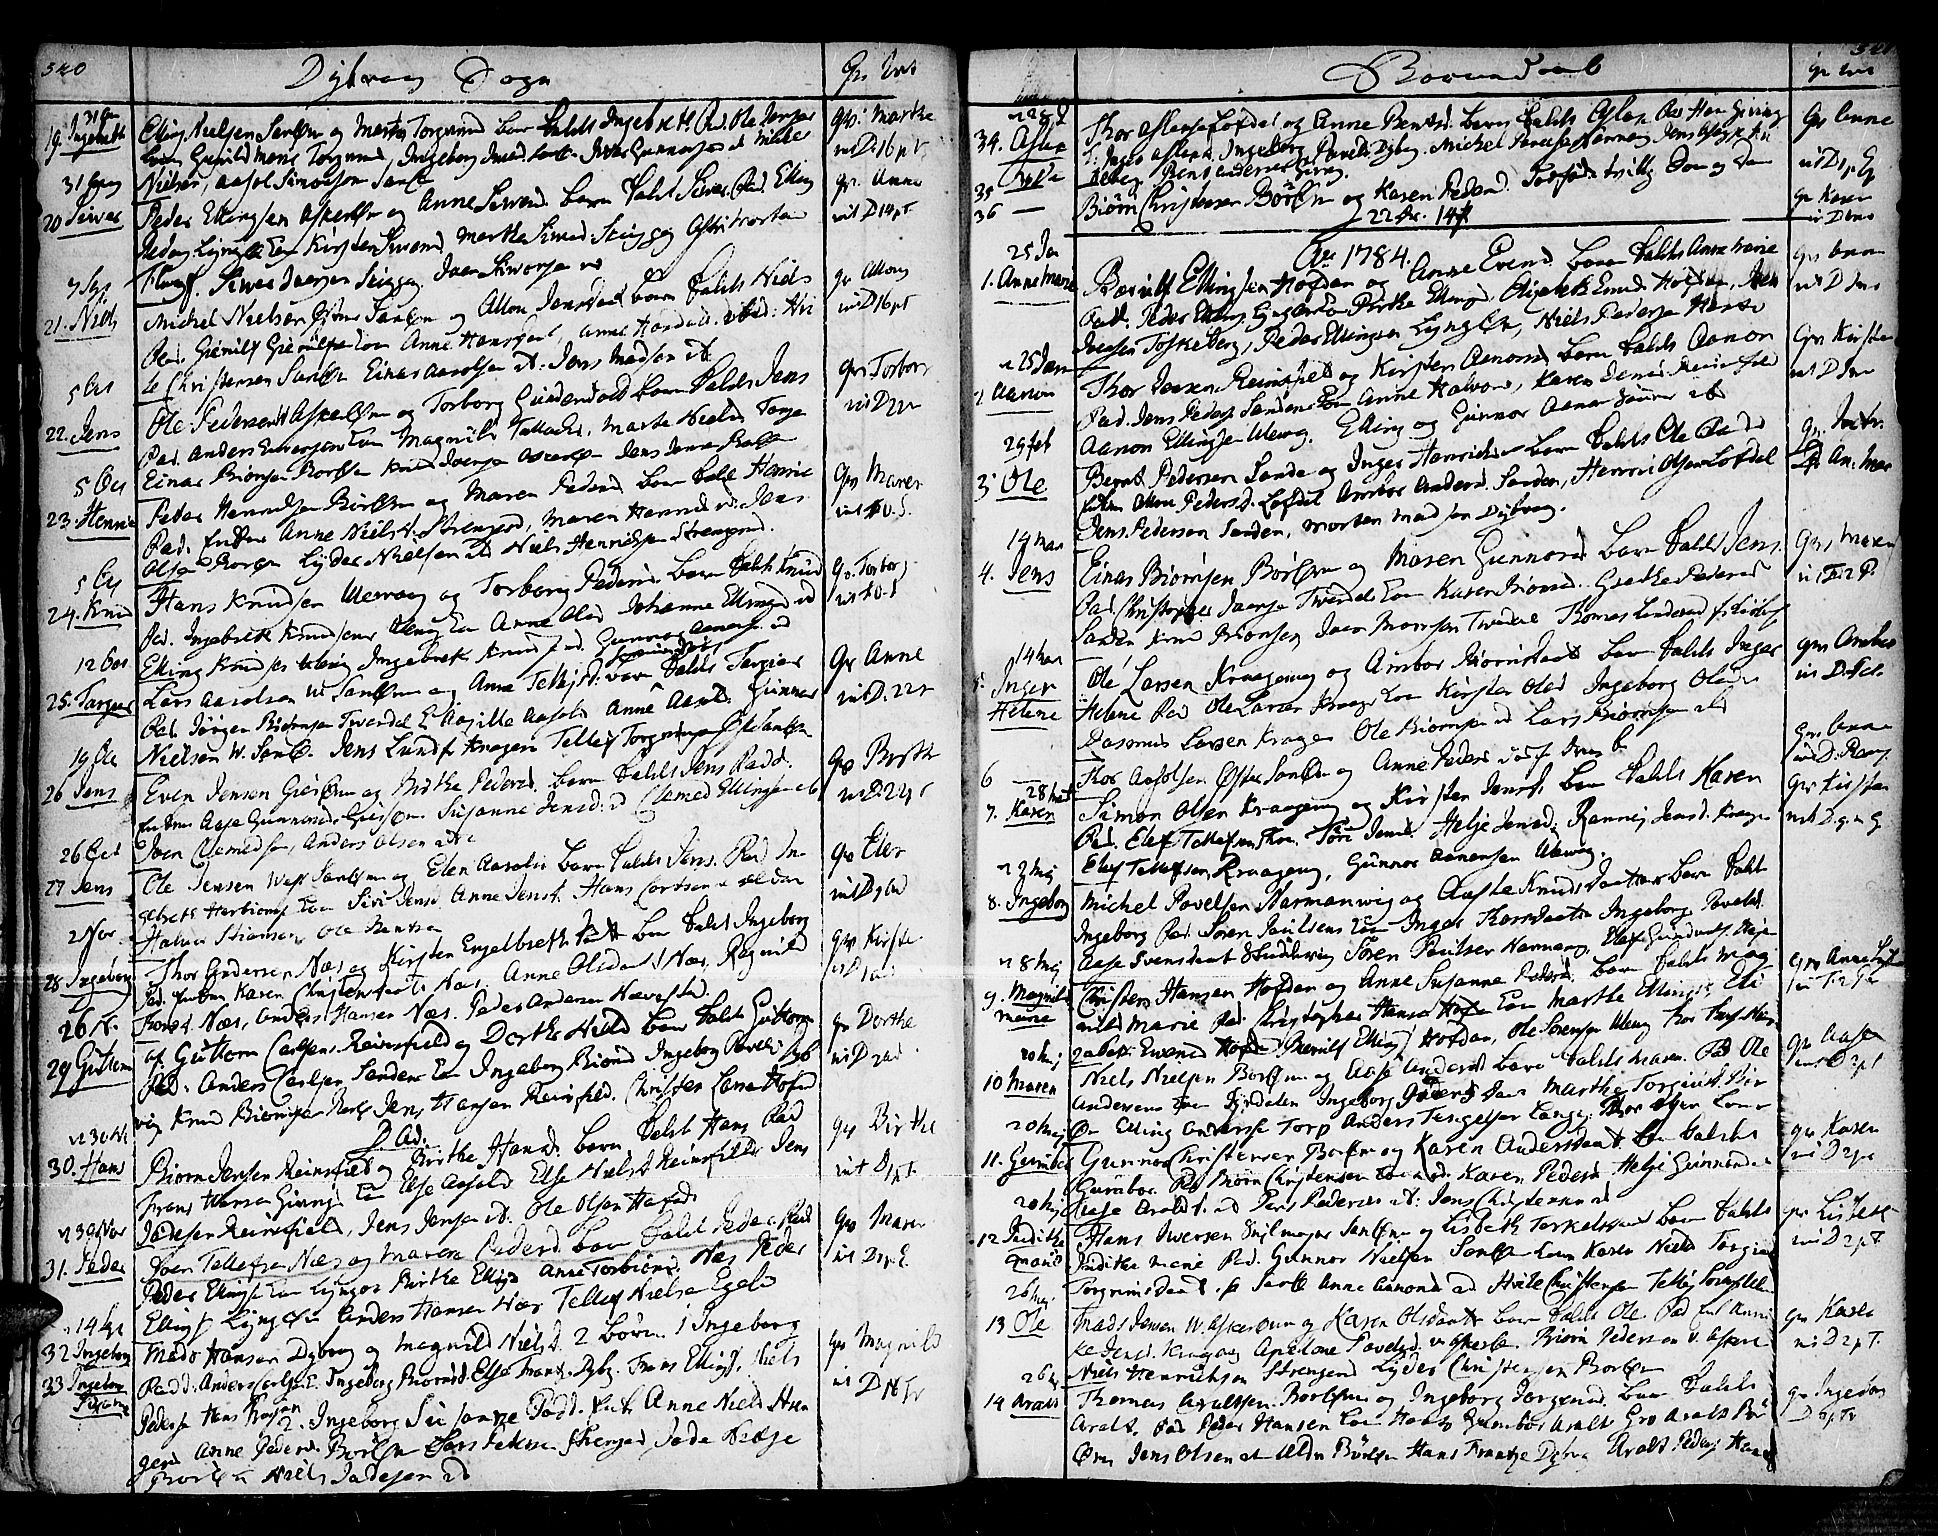 SAK, Dypvåg sokneprestkontor, F/Fa/Faa/L0001: Parish register (official) no. A 1 /1, 1765-1798, p. 540-541